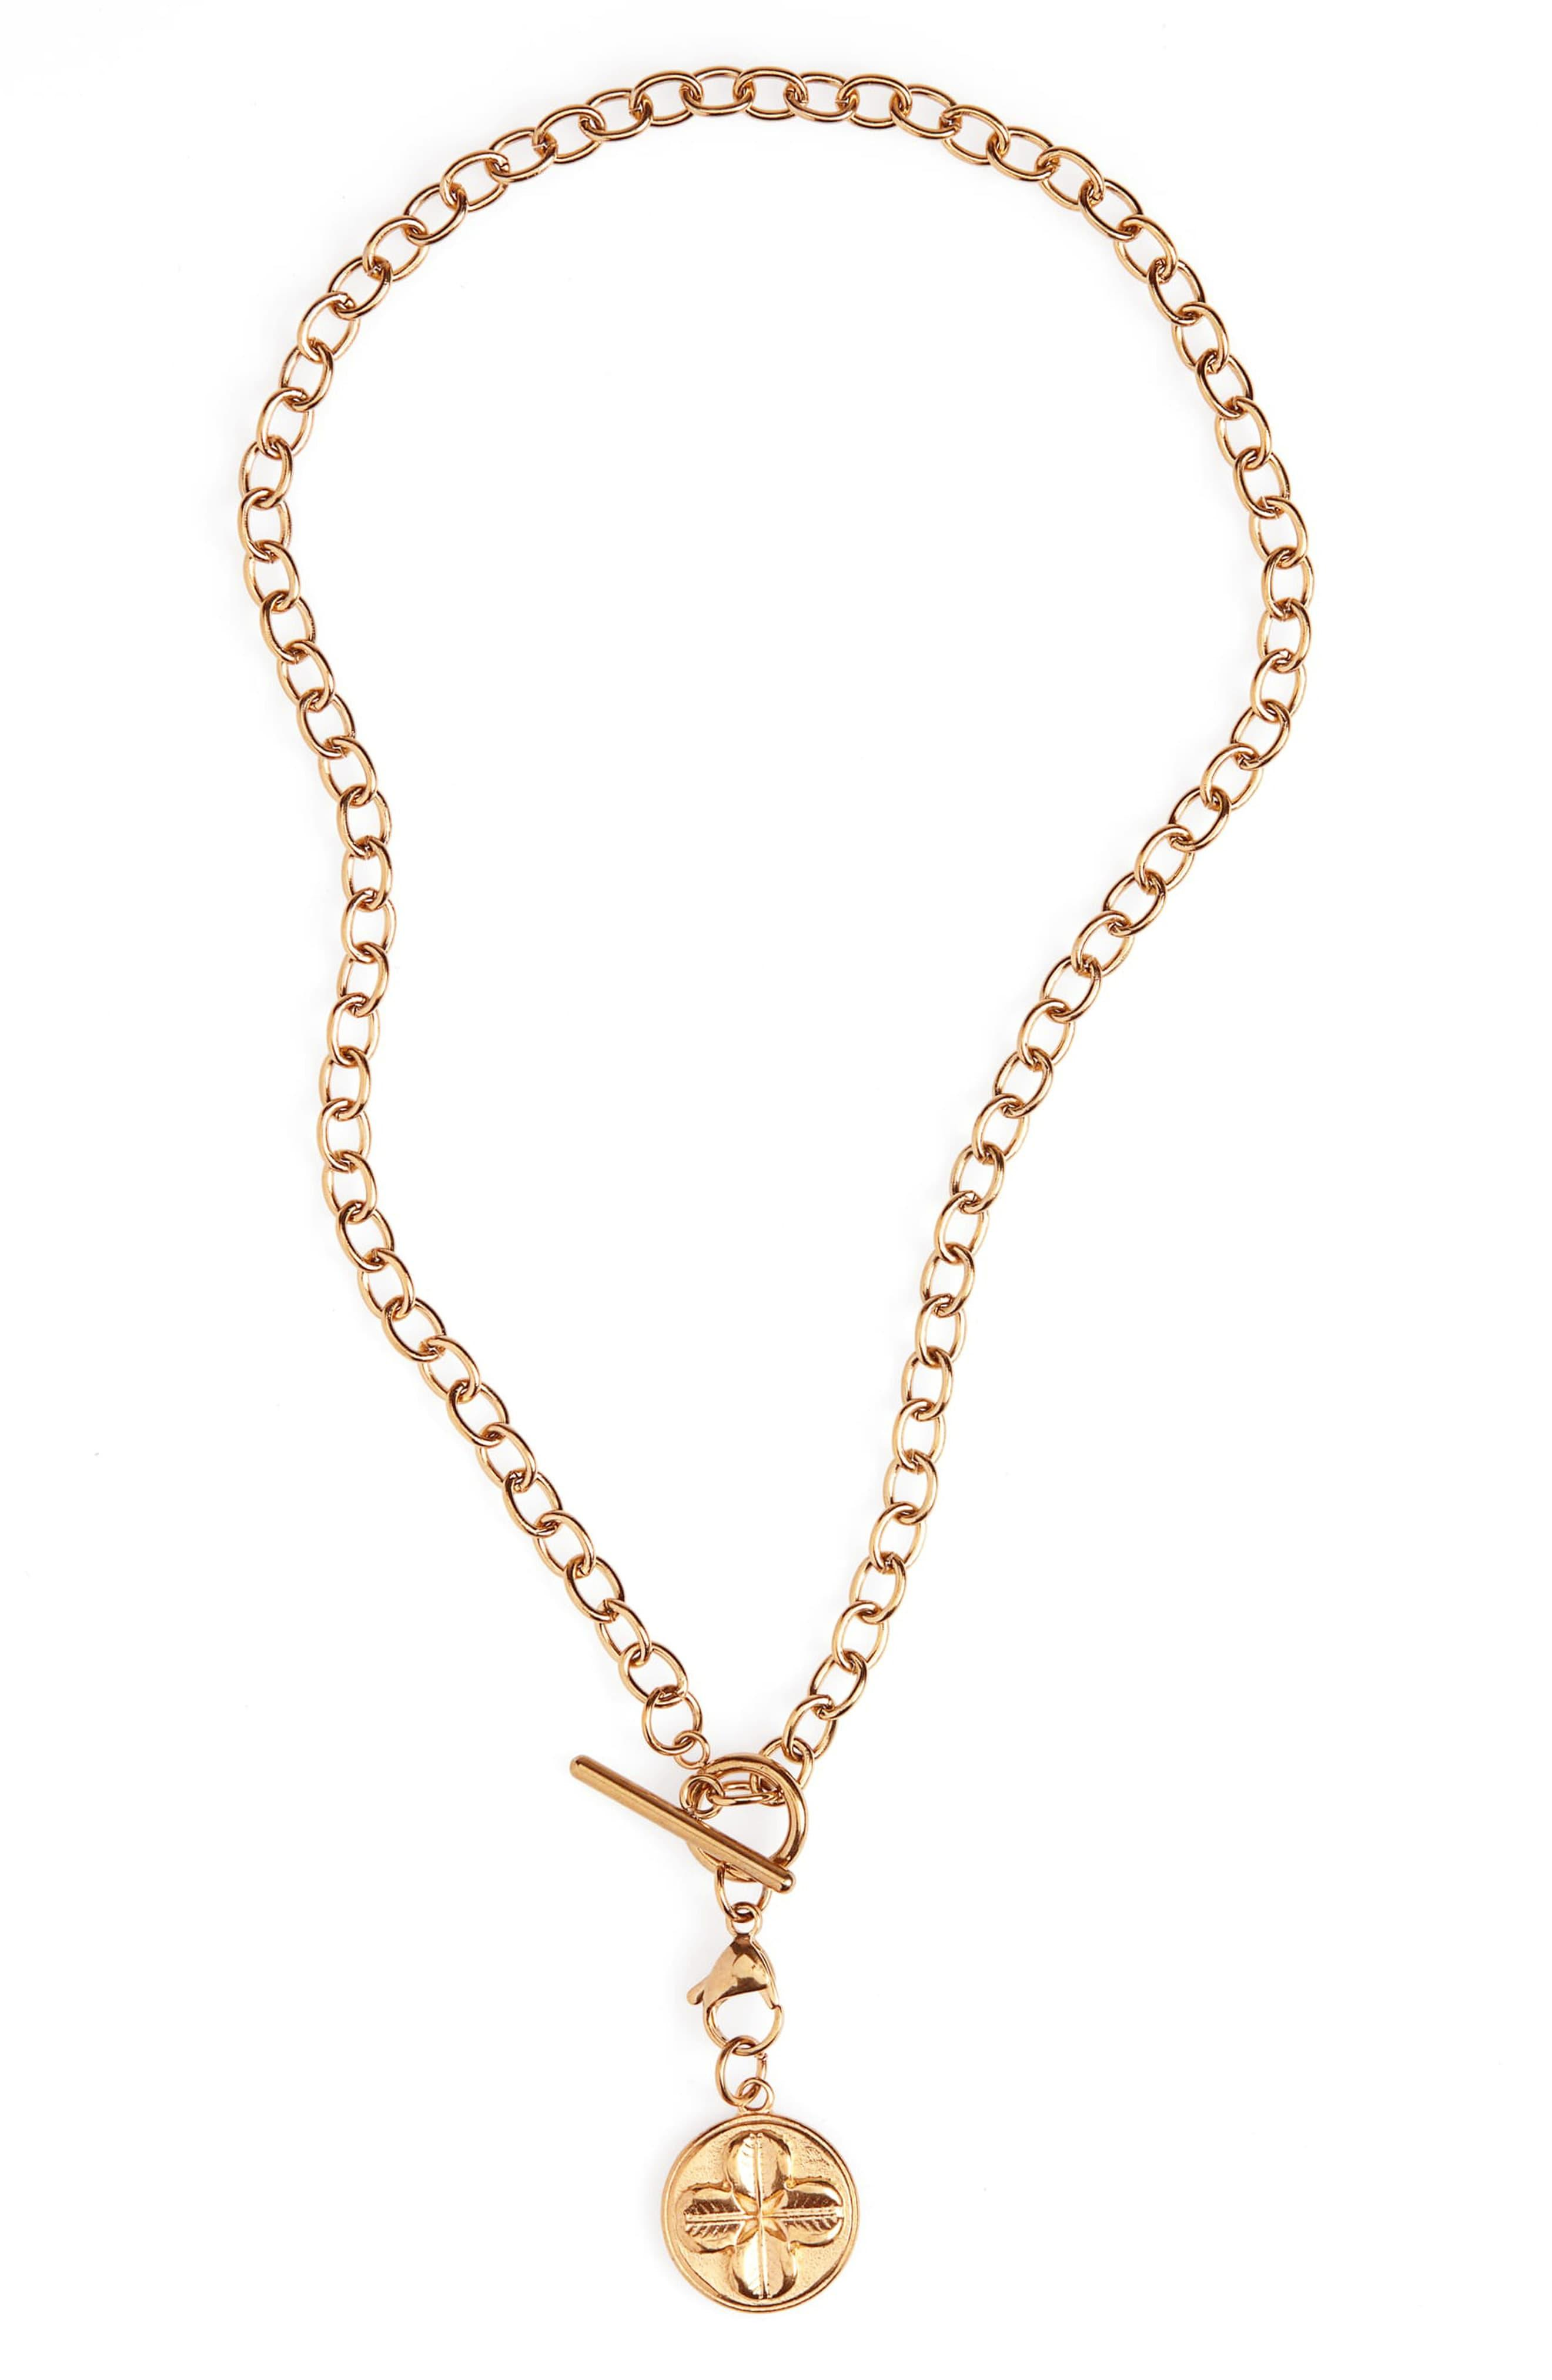 257bac6cf Ellie Vail - Metallic Sasha Clover Medallion Necklace - Lyst. View  fullscreen